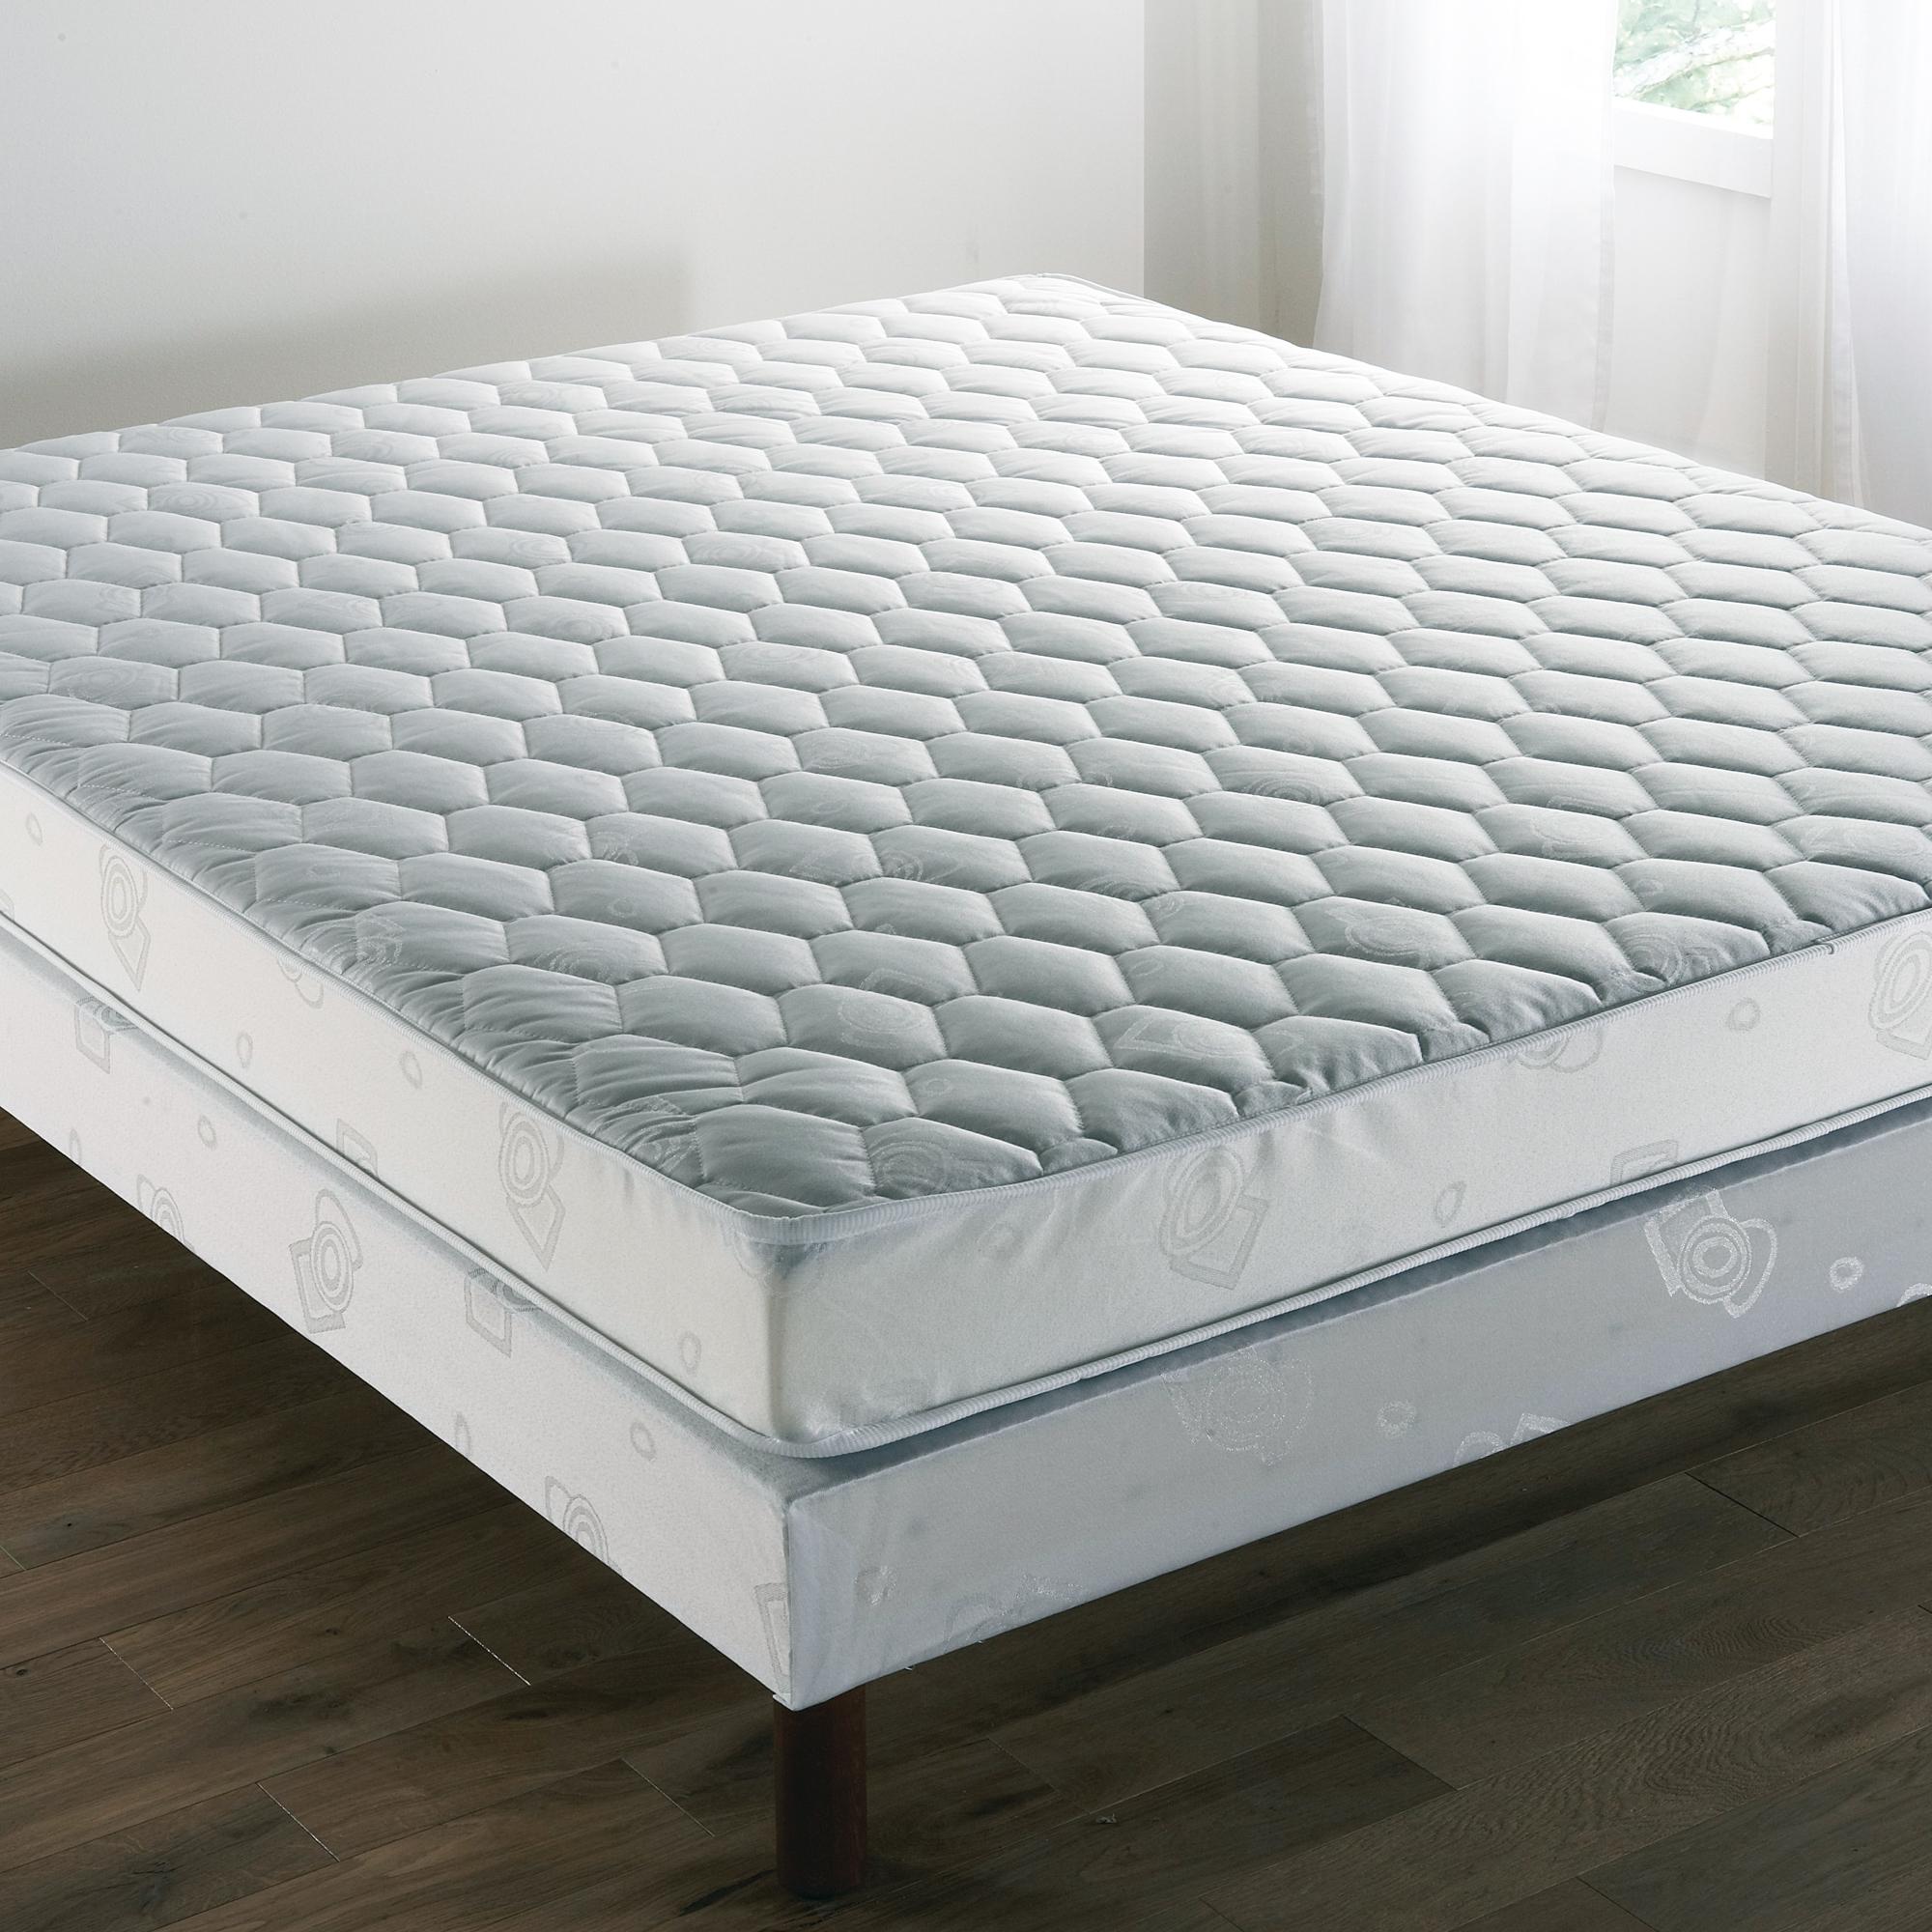 ensemble matelas confort ferme sommier tapissier. Black Bedroom Furniture Sets. Home Design Ideas